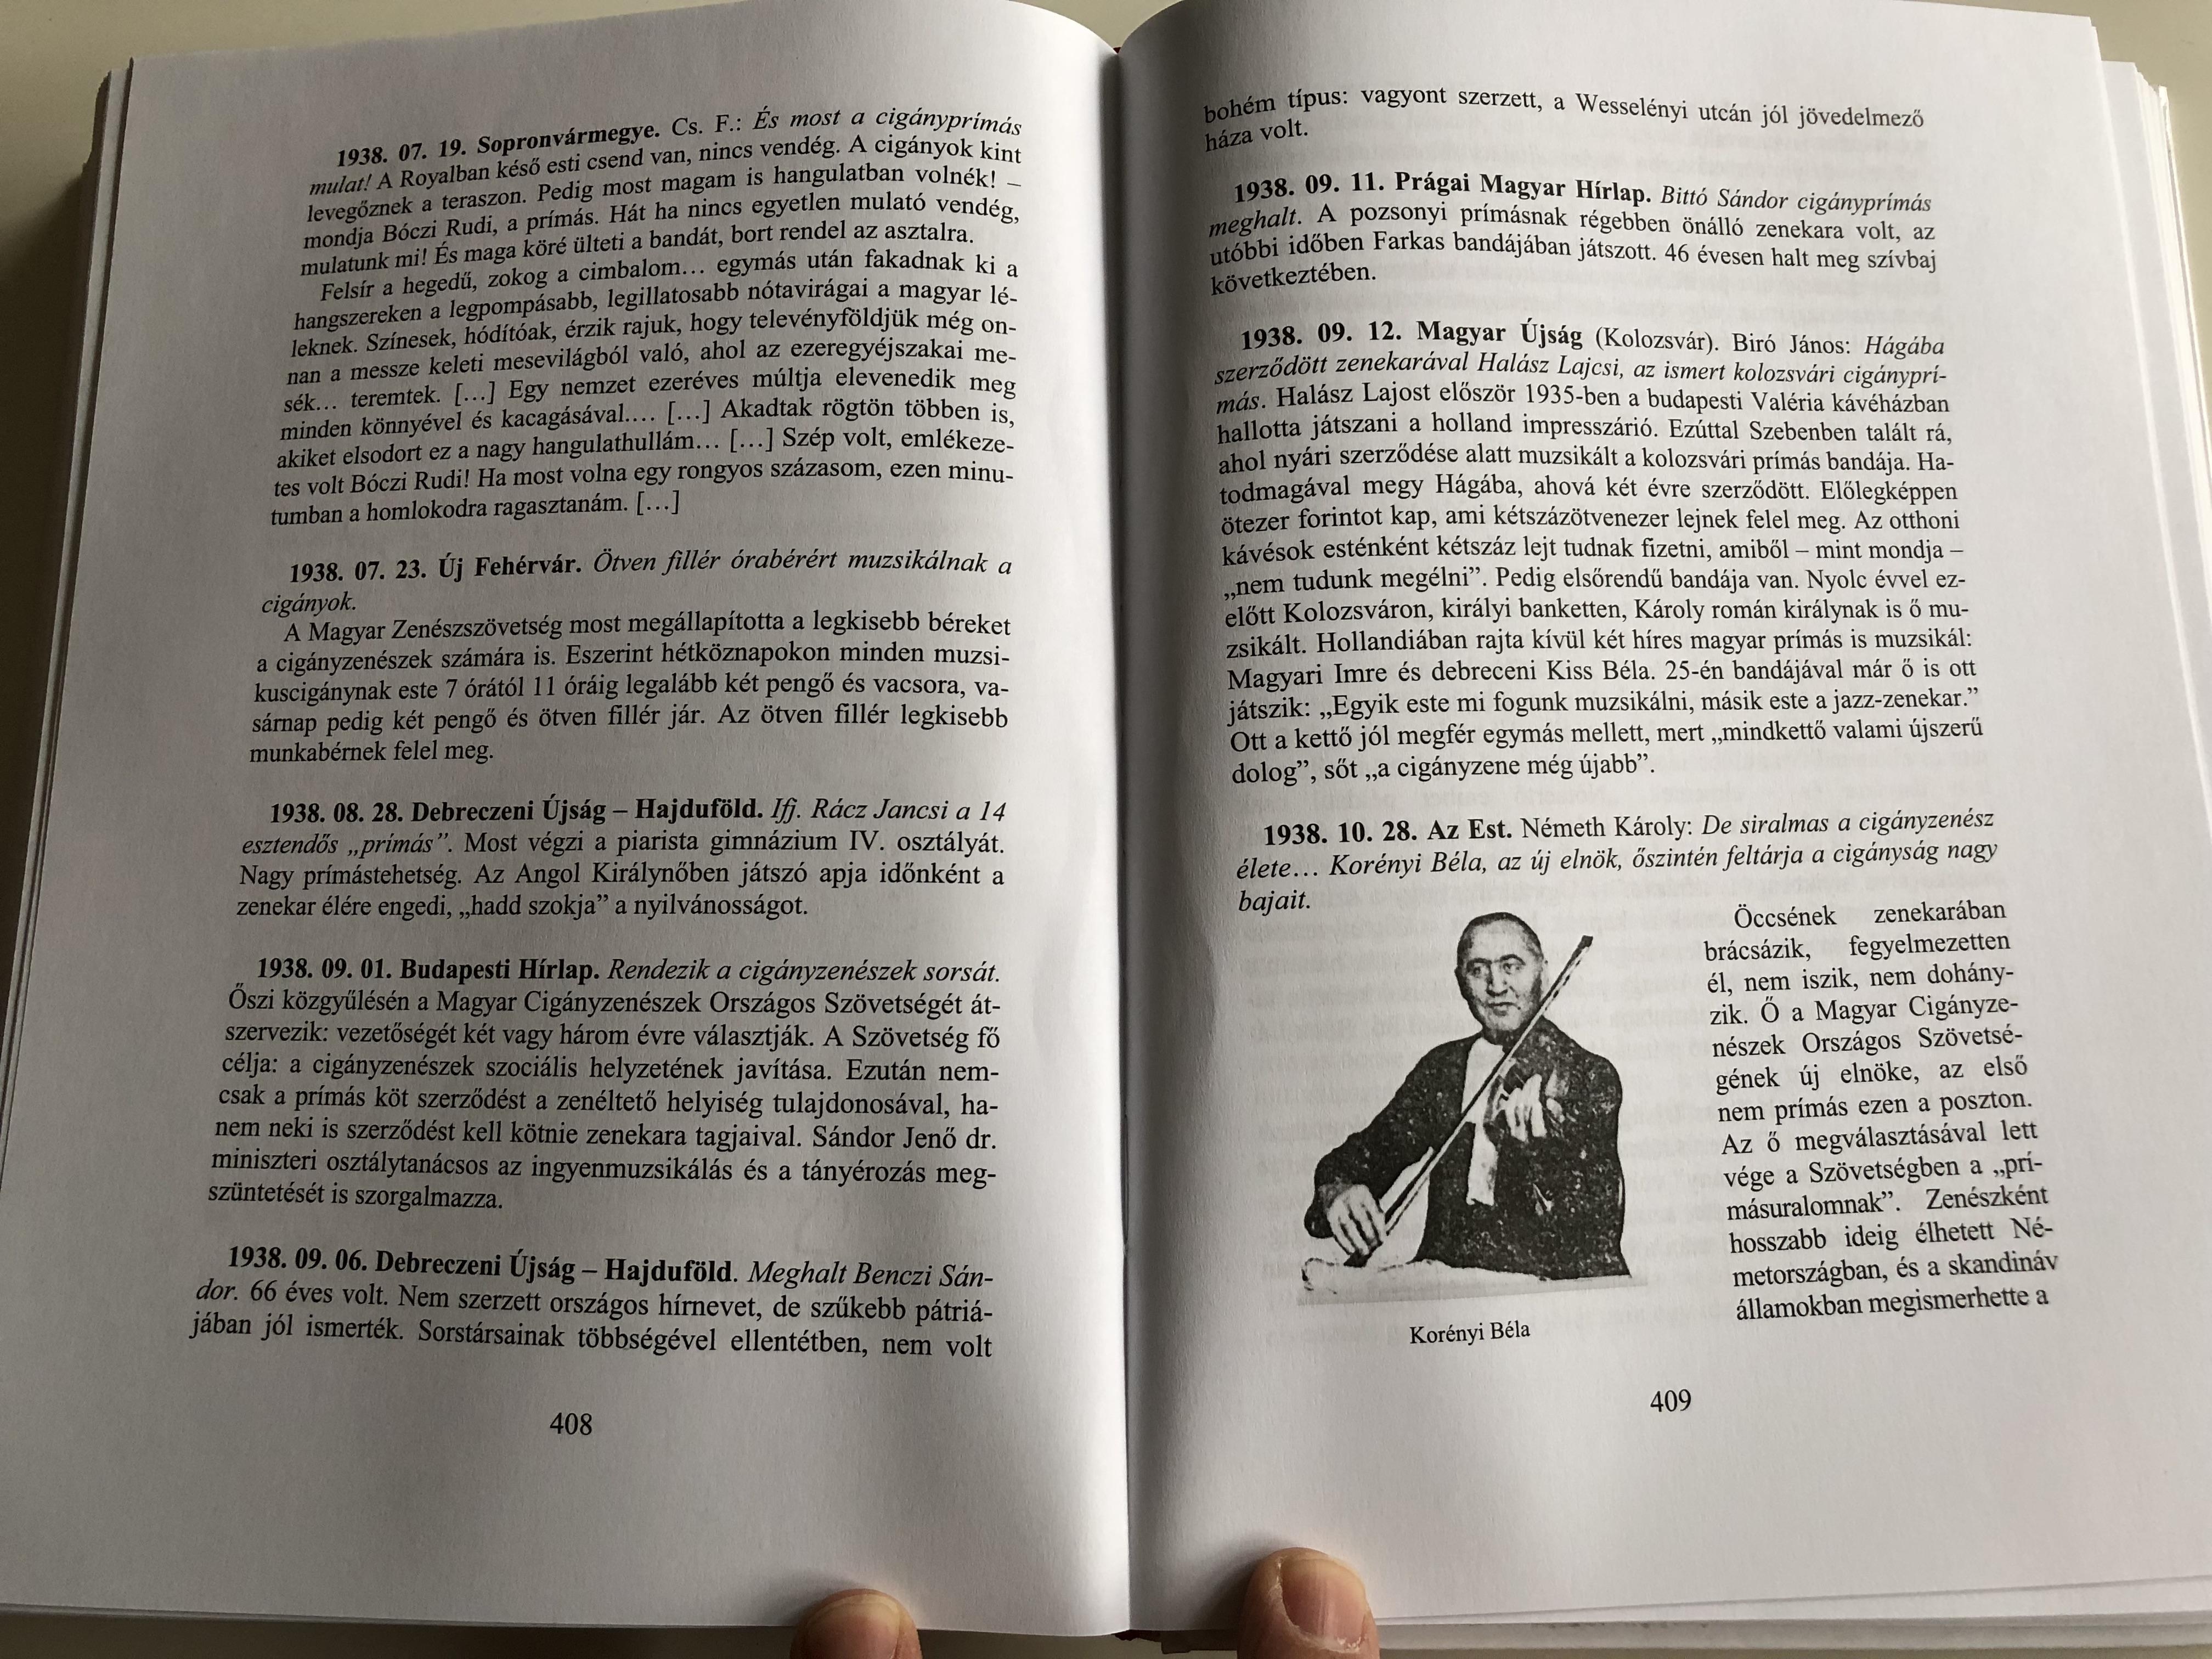 a-cig-nyzenekar-m-ltja-ii-1904-1944-by-s-rosi-b-lint-az-egykor-sajt-t-kr-ben-the-history-of-the-hungarian-gypsy-orchestra-1904-1944-nap-kiad-hardcover-2012-12-.jpg